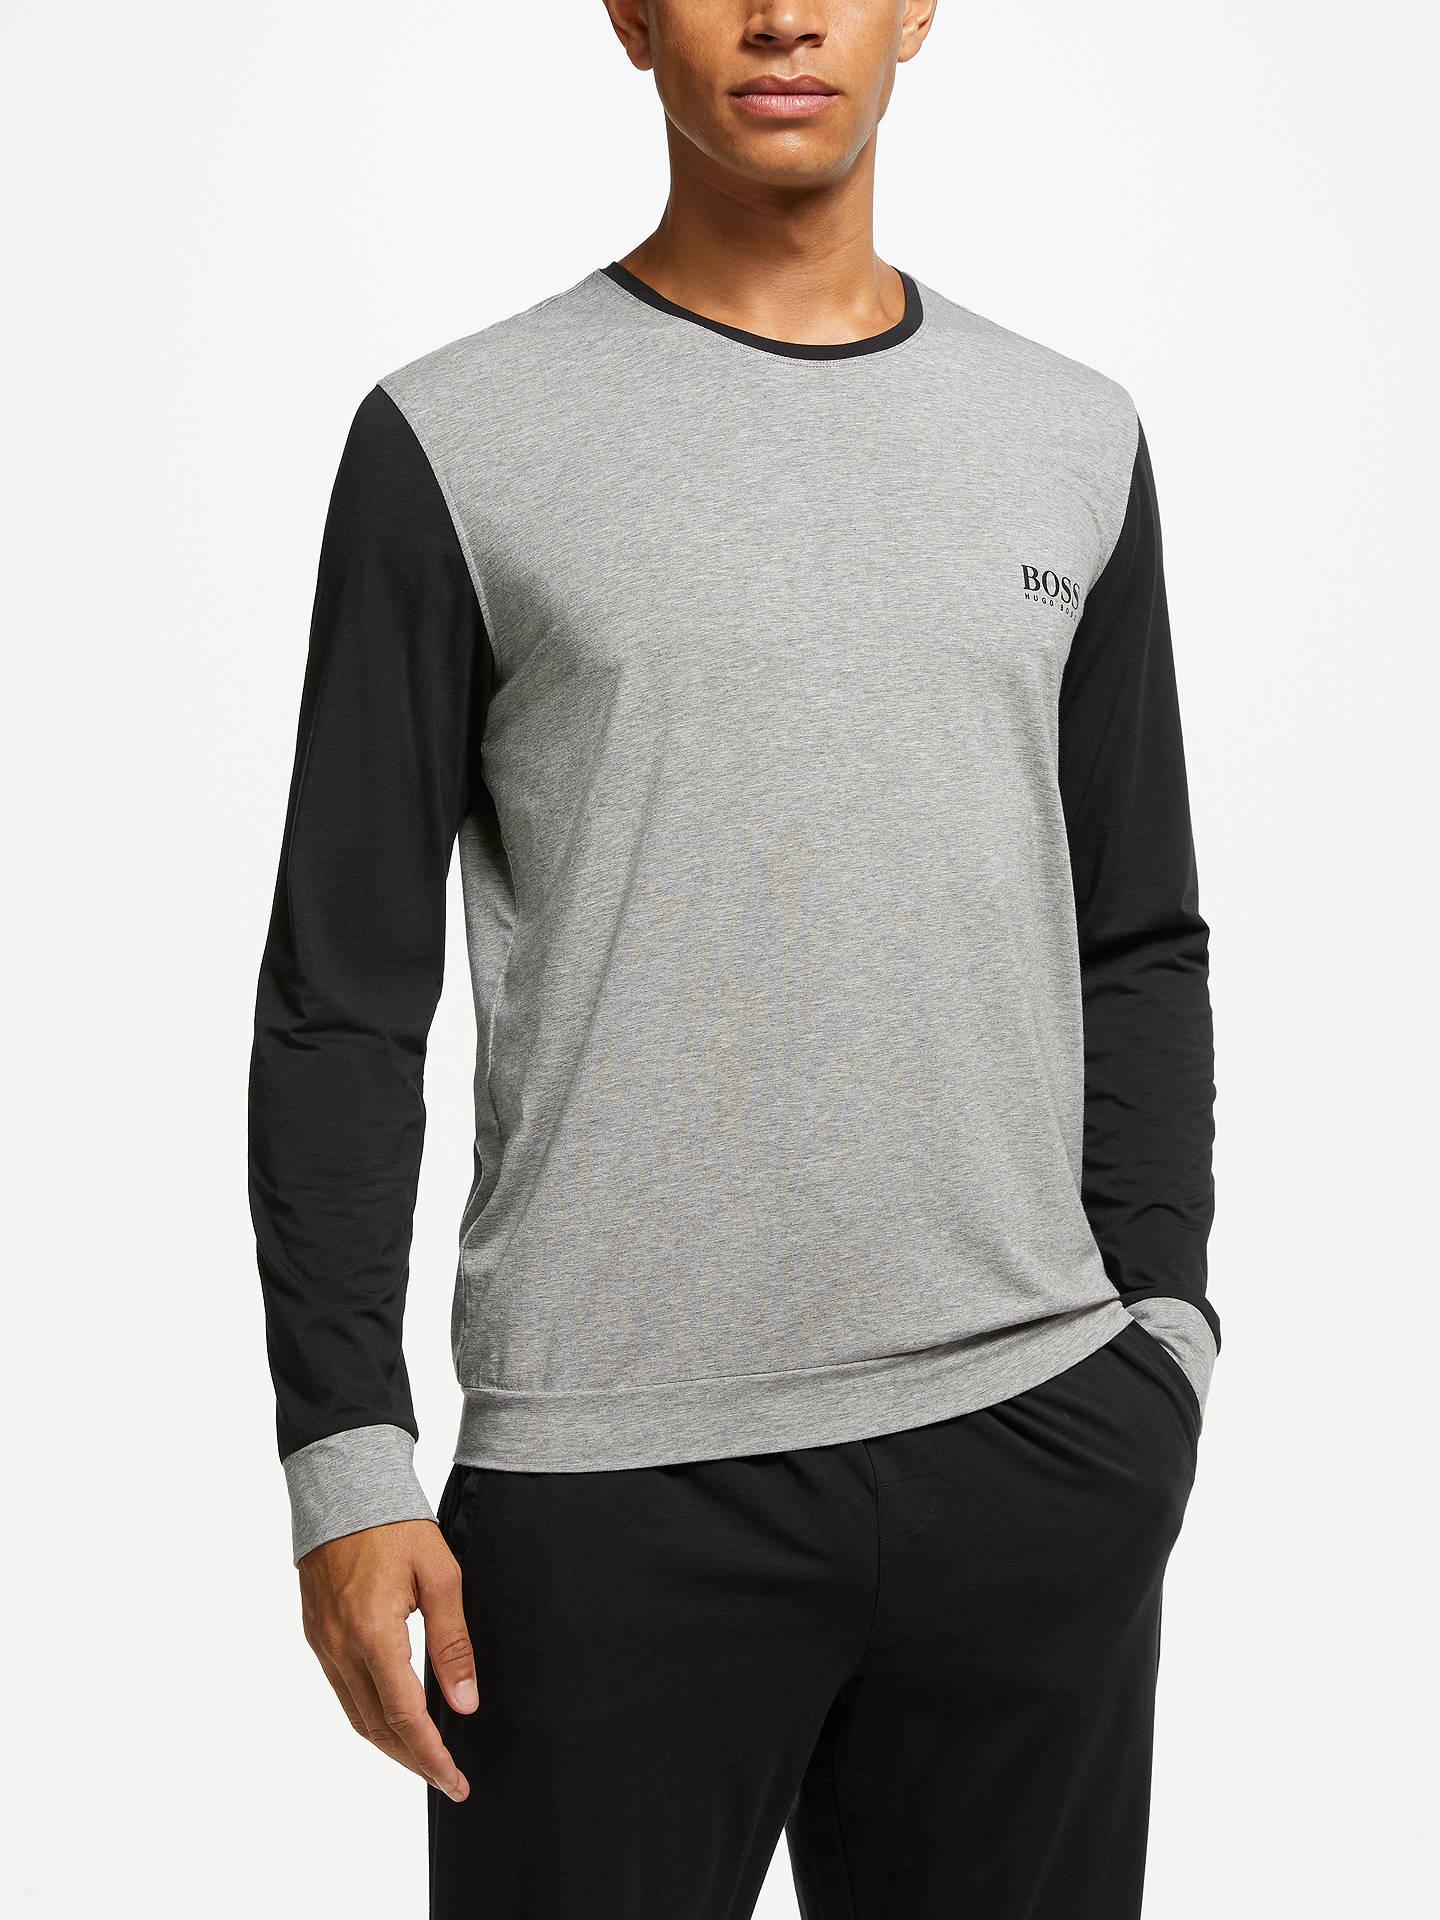 46b97d3ef7 Buy BOSS Balance Contrast Detail Jersey Pyjama Top, Grey/Black, M Online at  ...